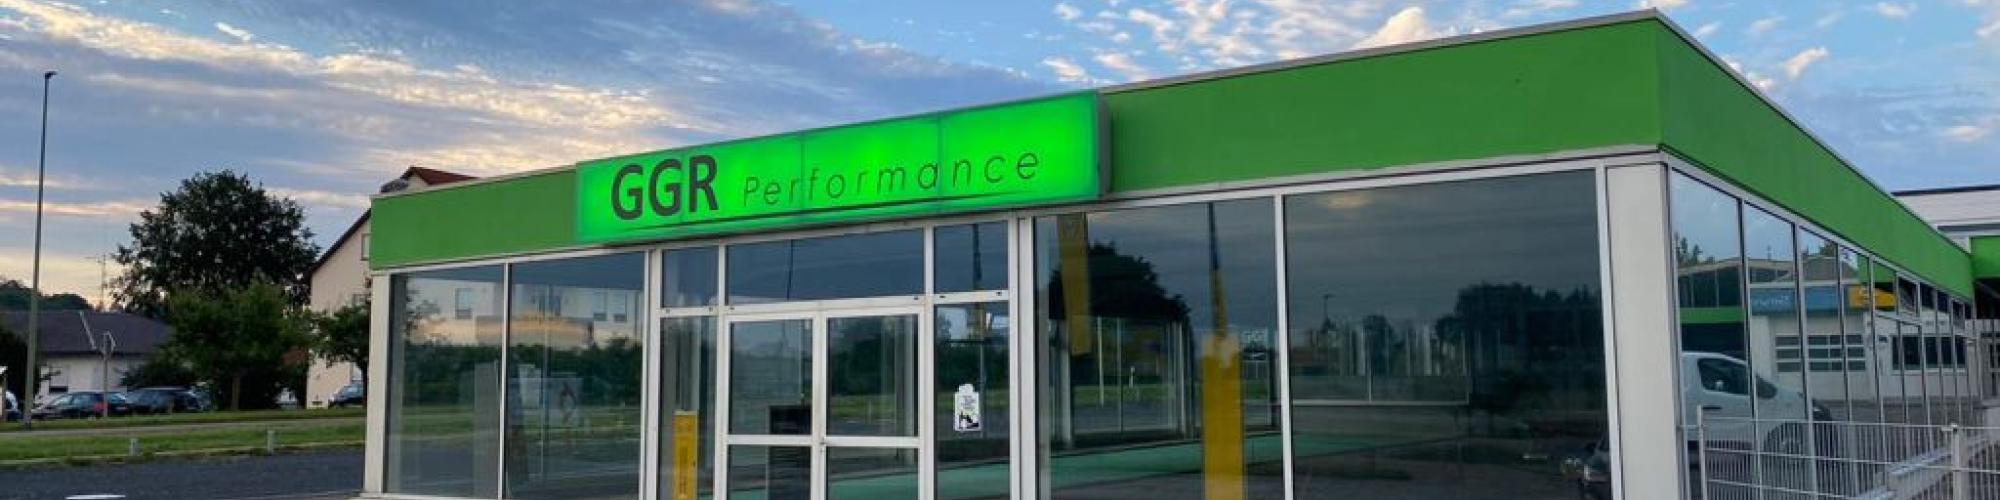 GGR Performance GbR